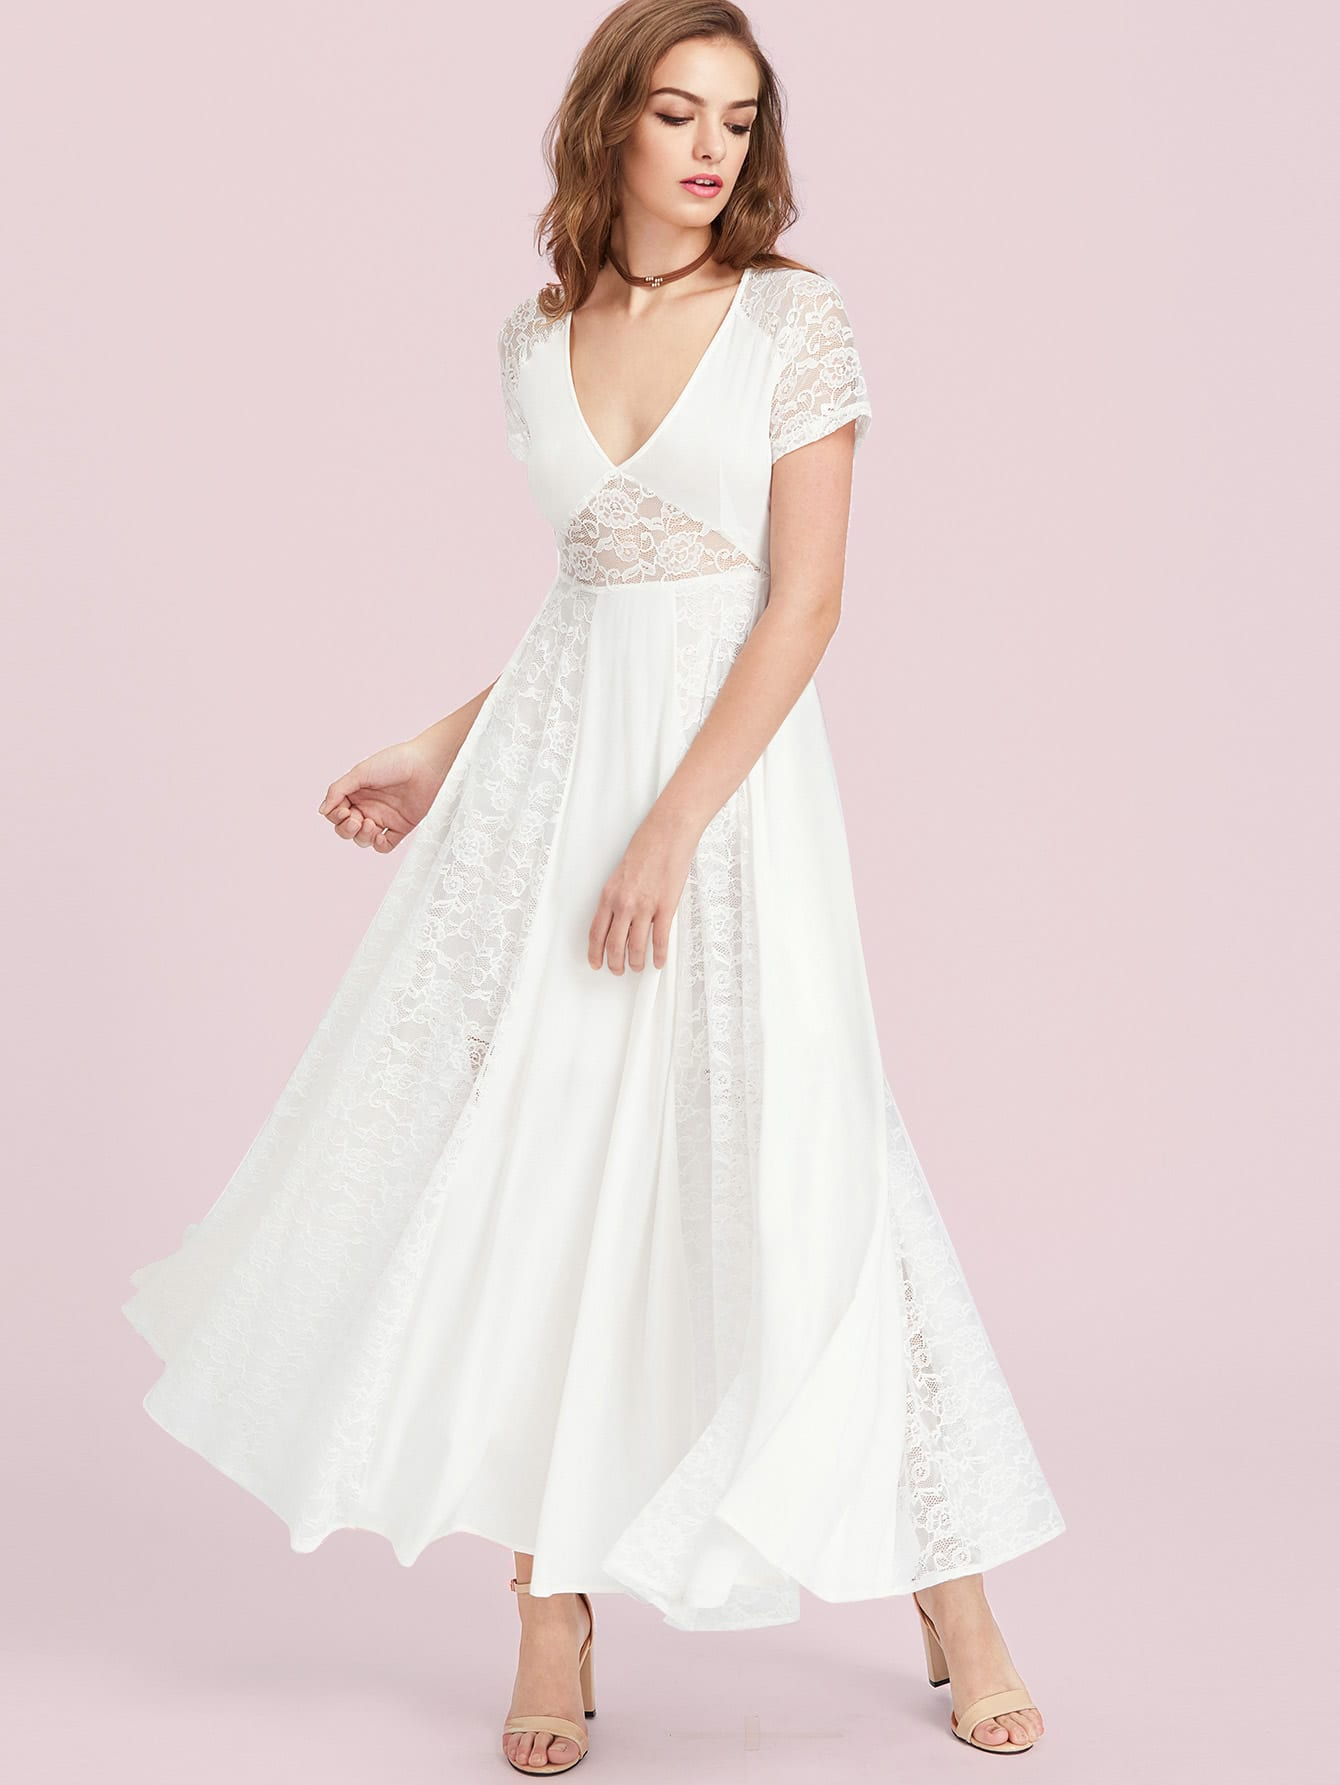 Raglan Sleeve Floral Lace Panel Peekaboo Dress dress170419454